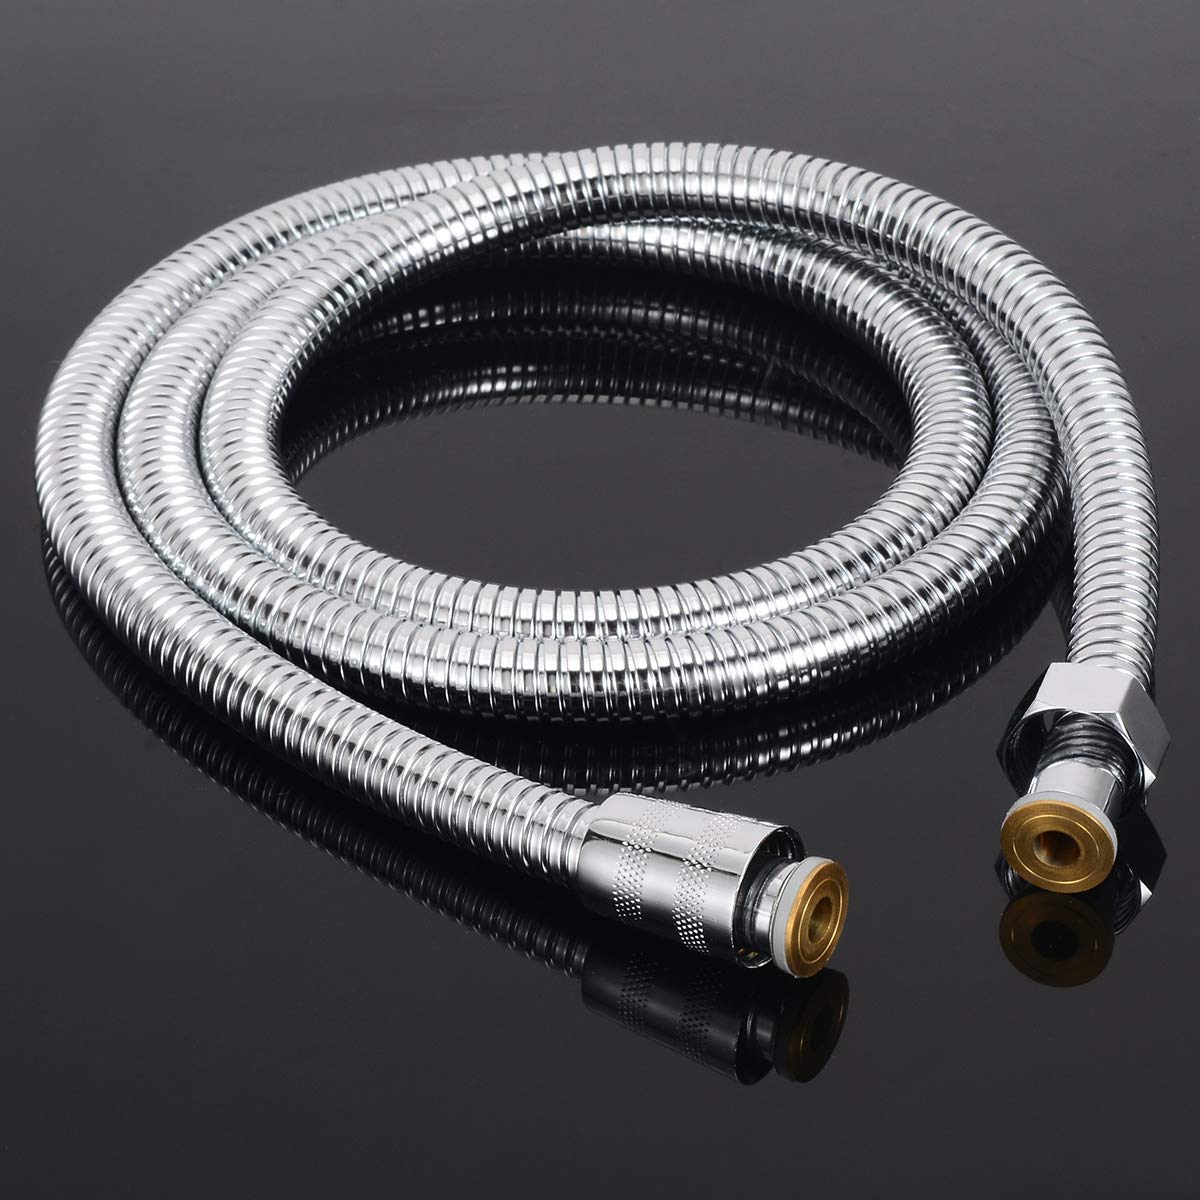 BTCS-X /® Damas bid/é Handheld aerosol Escuadra de pared WC grifo pulverizador Set-ba/ño-V/álvula de ba/ño grifo de la v/álvula-Kit de ducha de accesorios de ba/ño Env/ío gratis